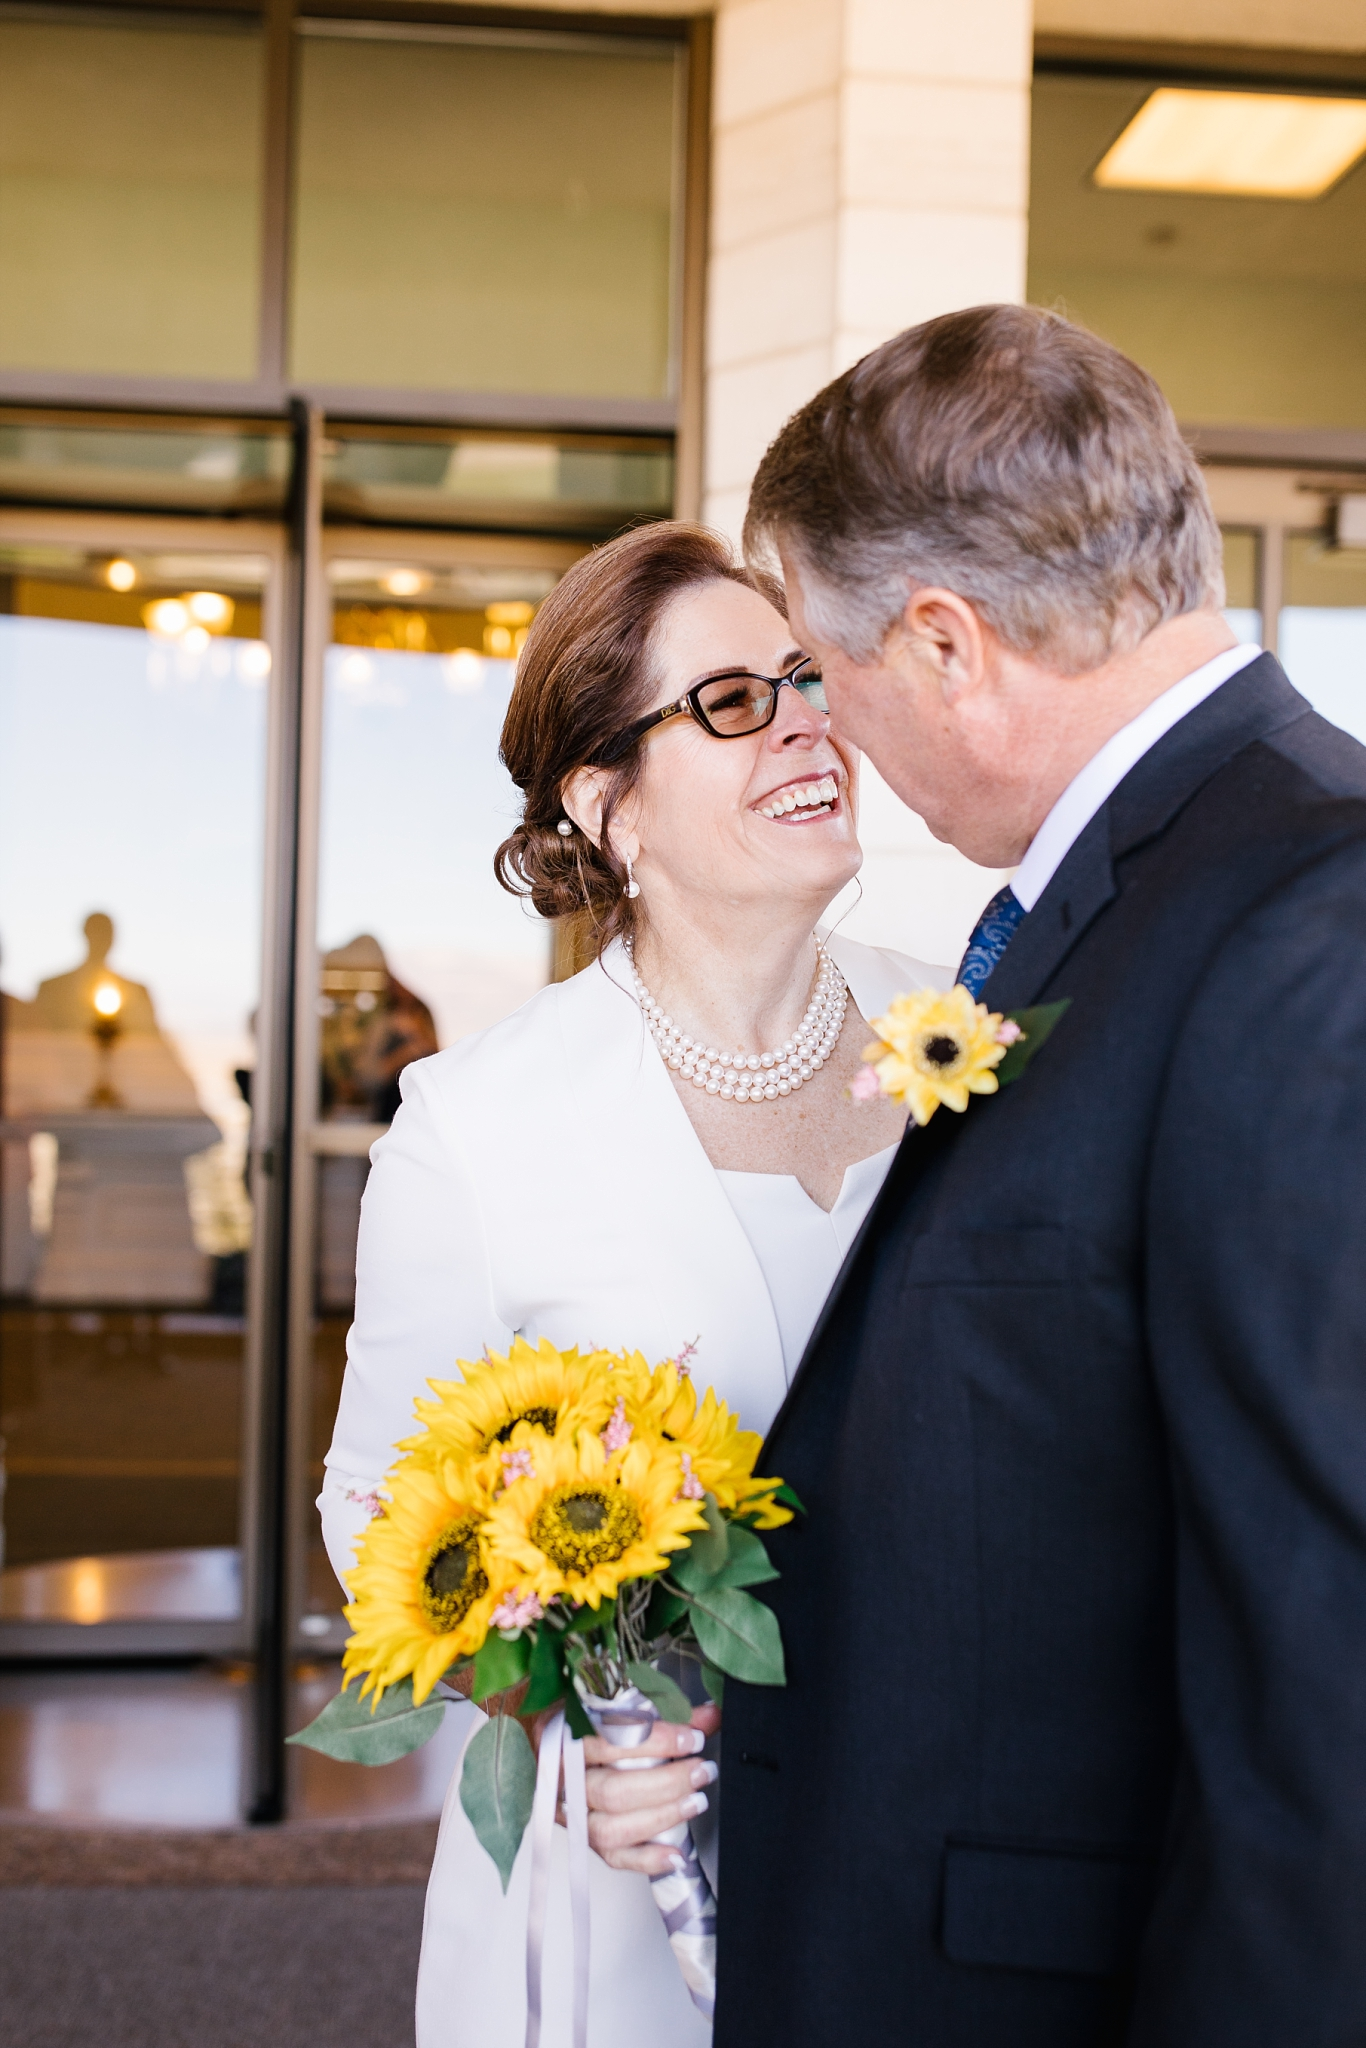 PDWeddingDay-4_Lizzie-B-Imagery-Utah-Wedding-Photographer-Park-City-Salt-Lake-City-Manti-Utah-Temple.jpg